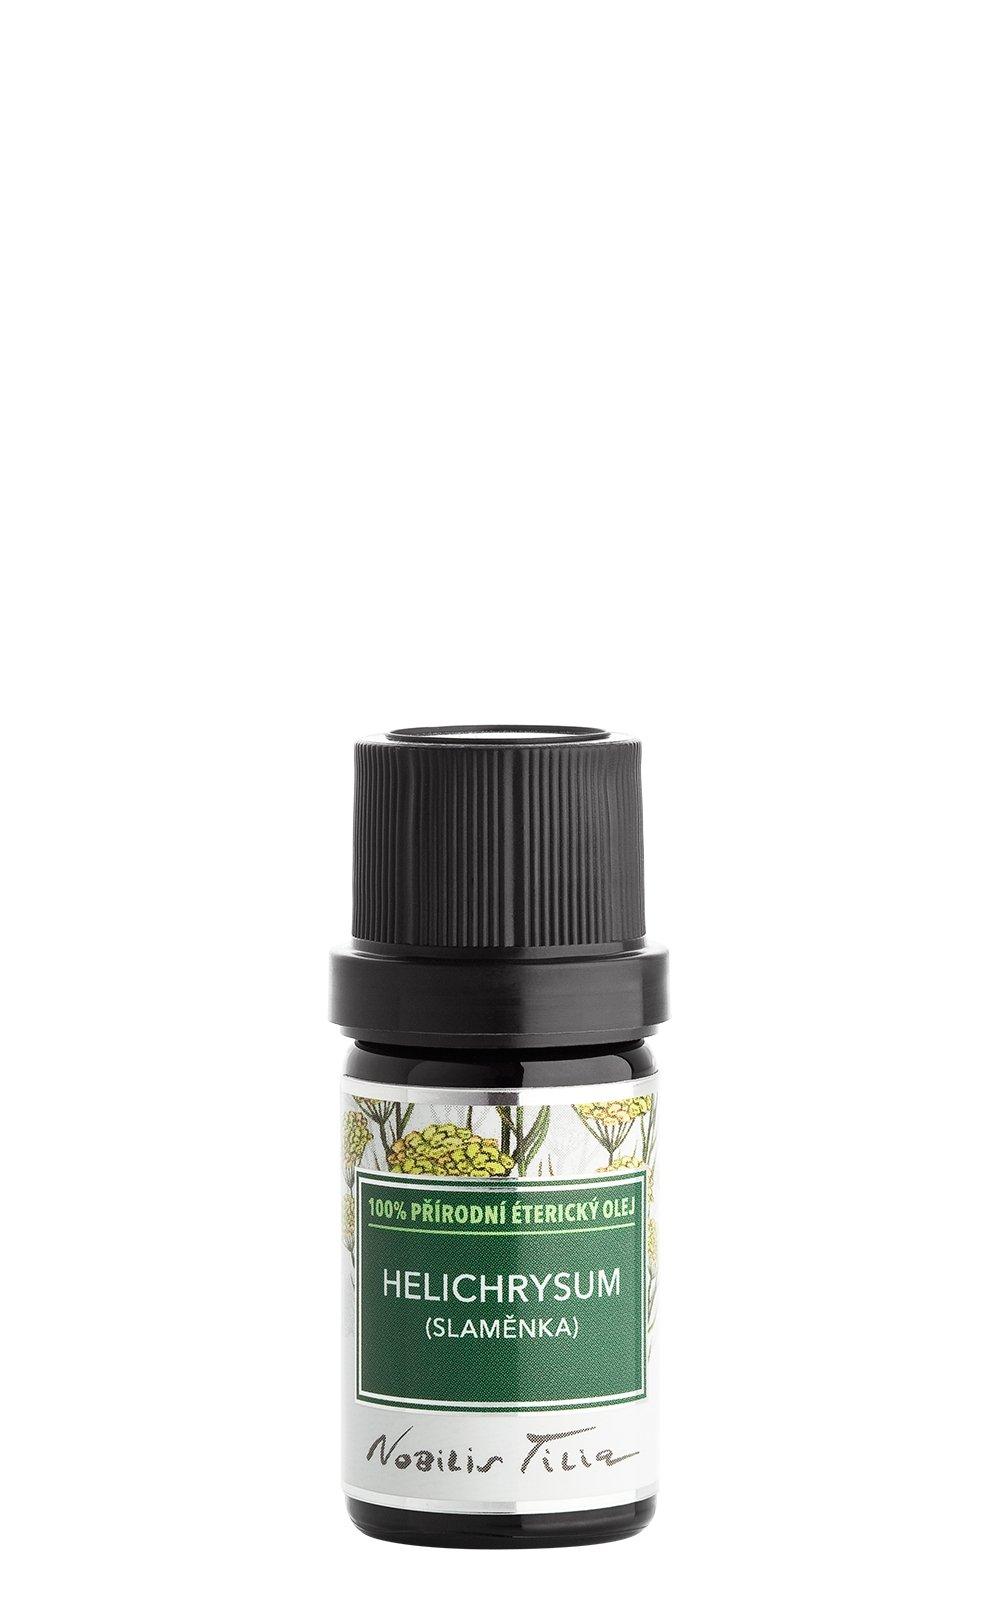 Éterický olej Helichrysum (slaměnka): 5 ml